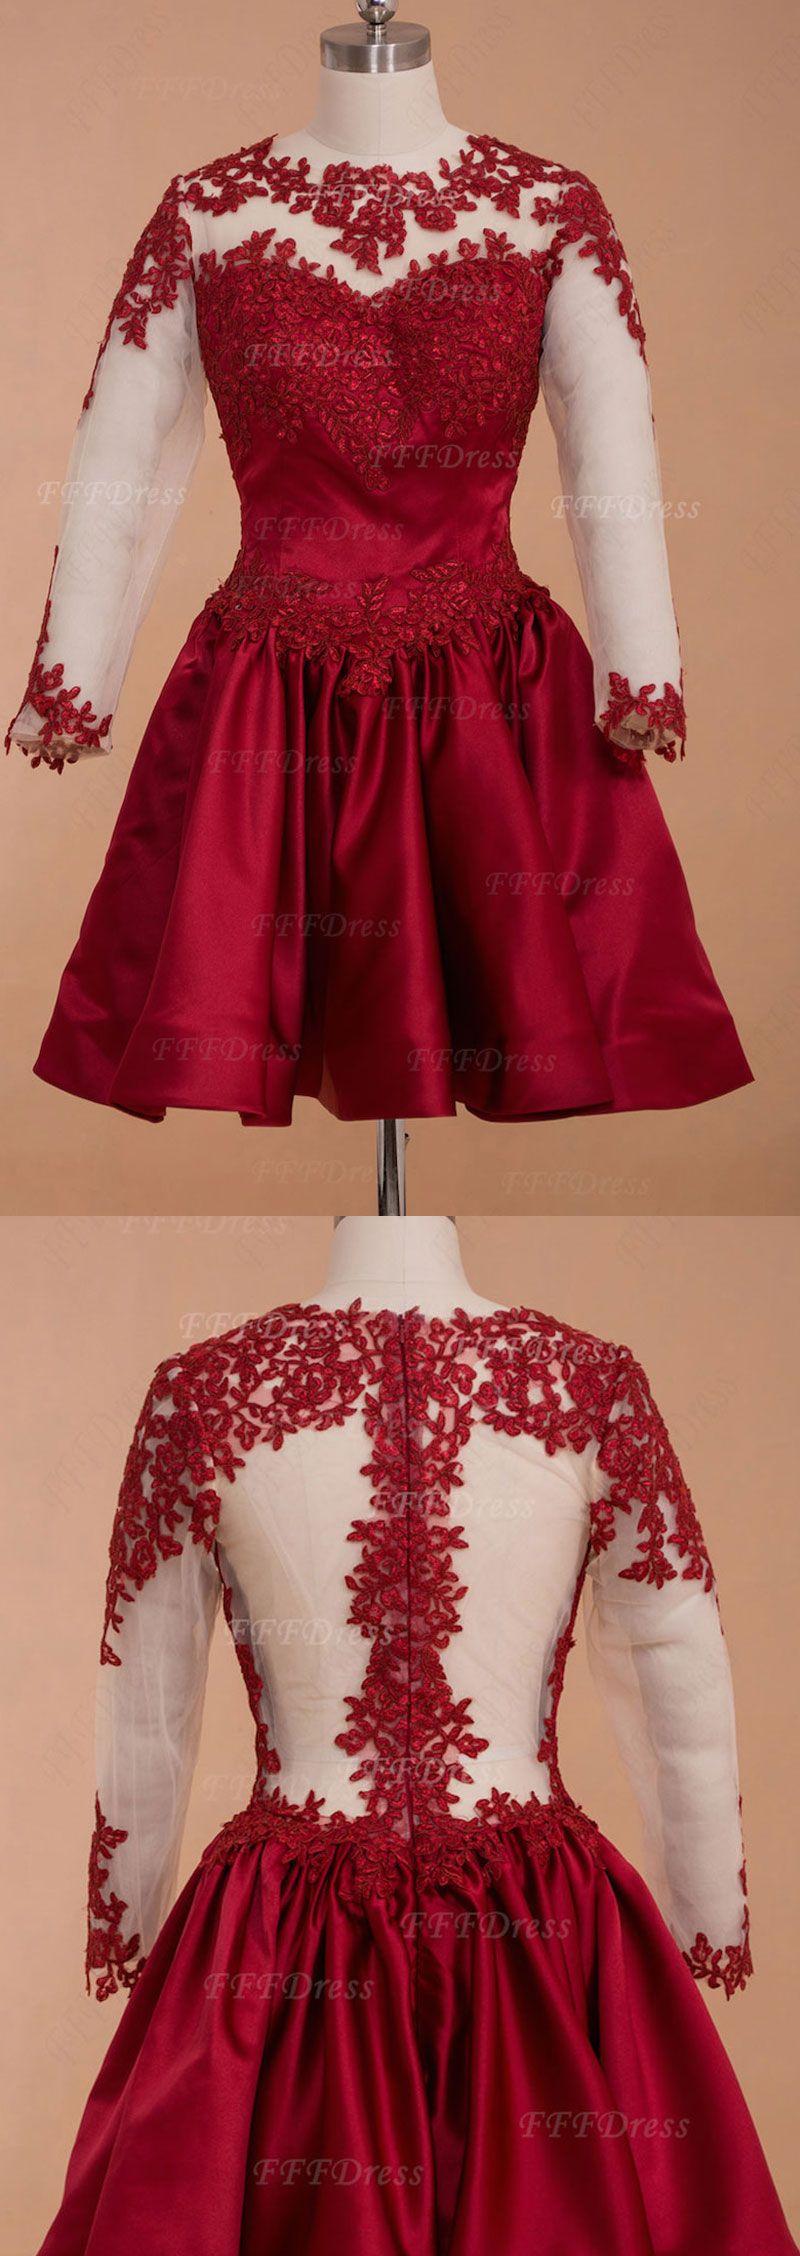 Burgundy backless short prom dresses long sleeves homecoming dresses